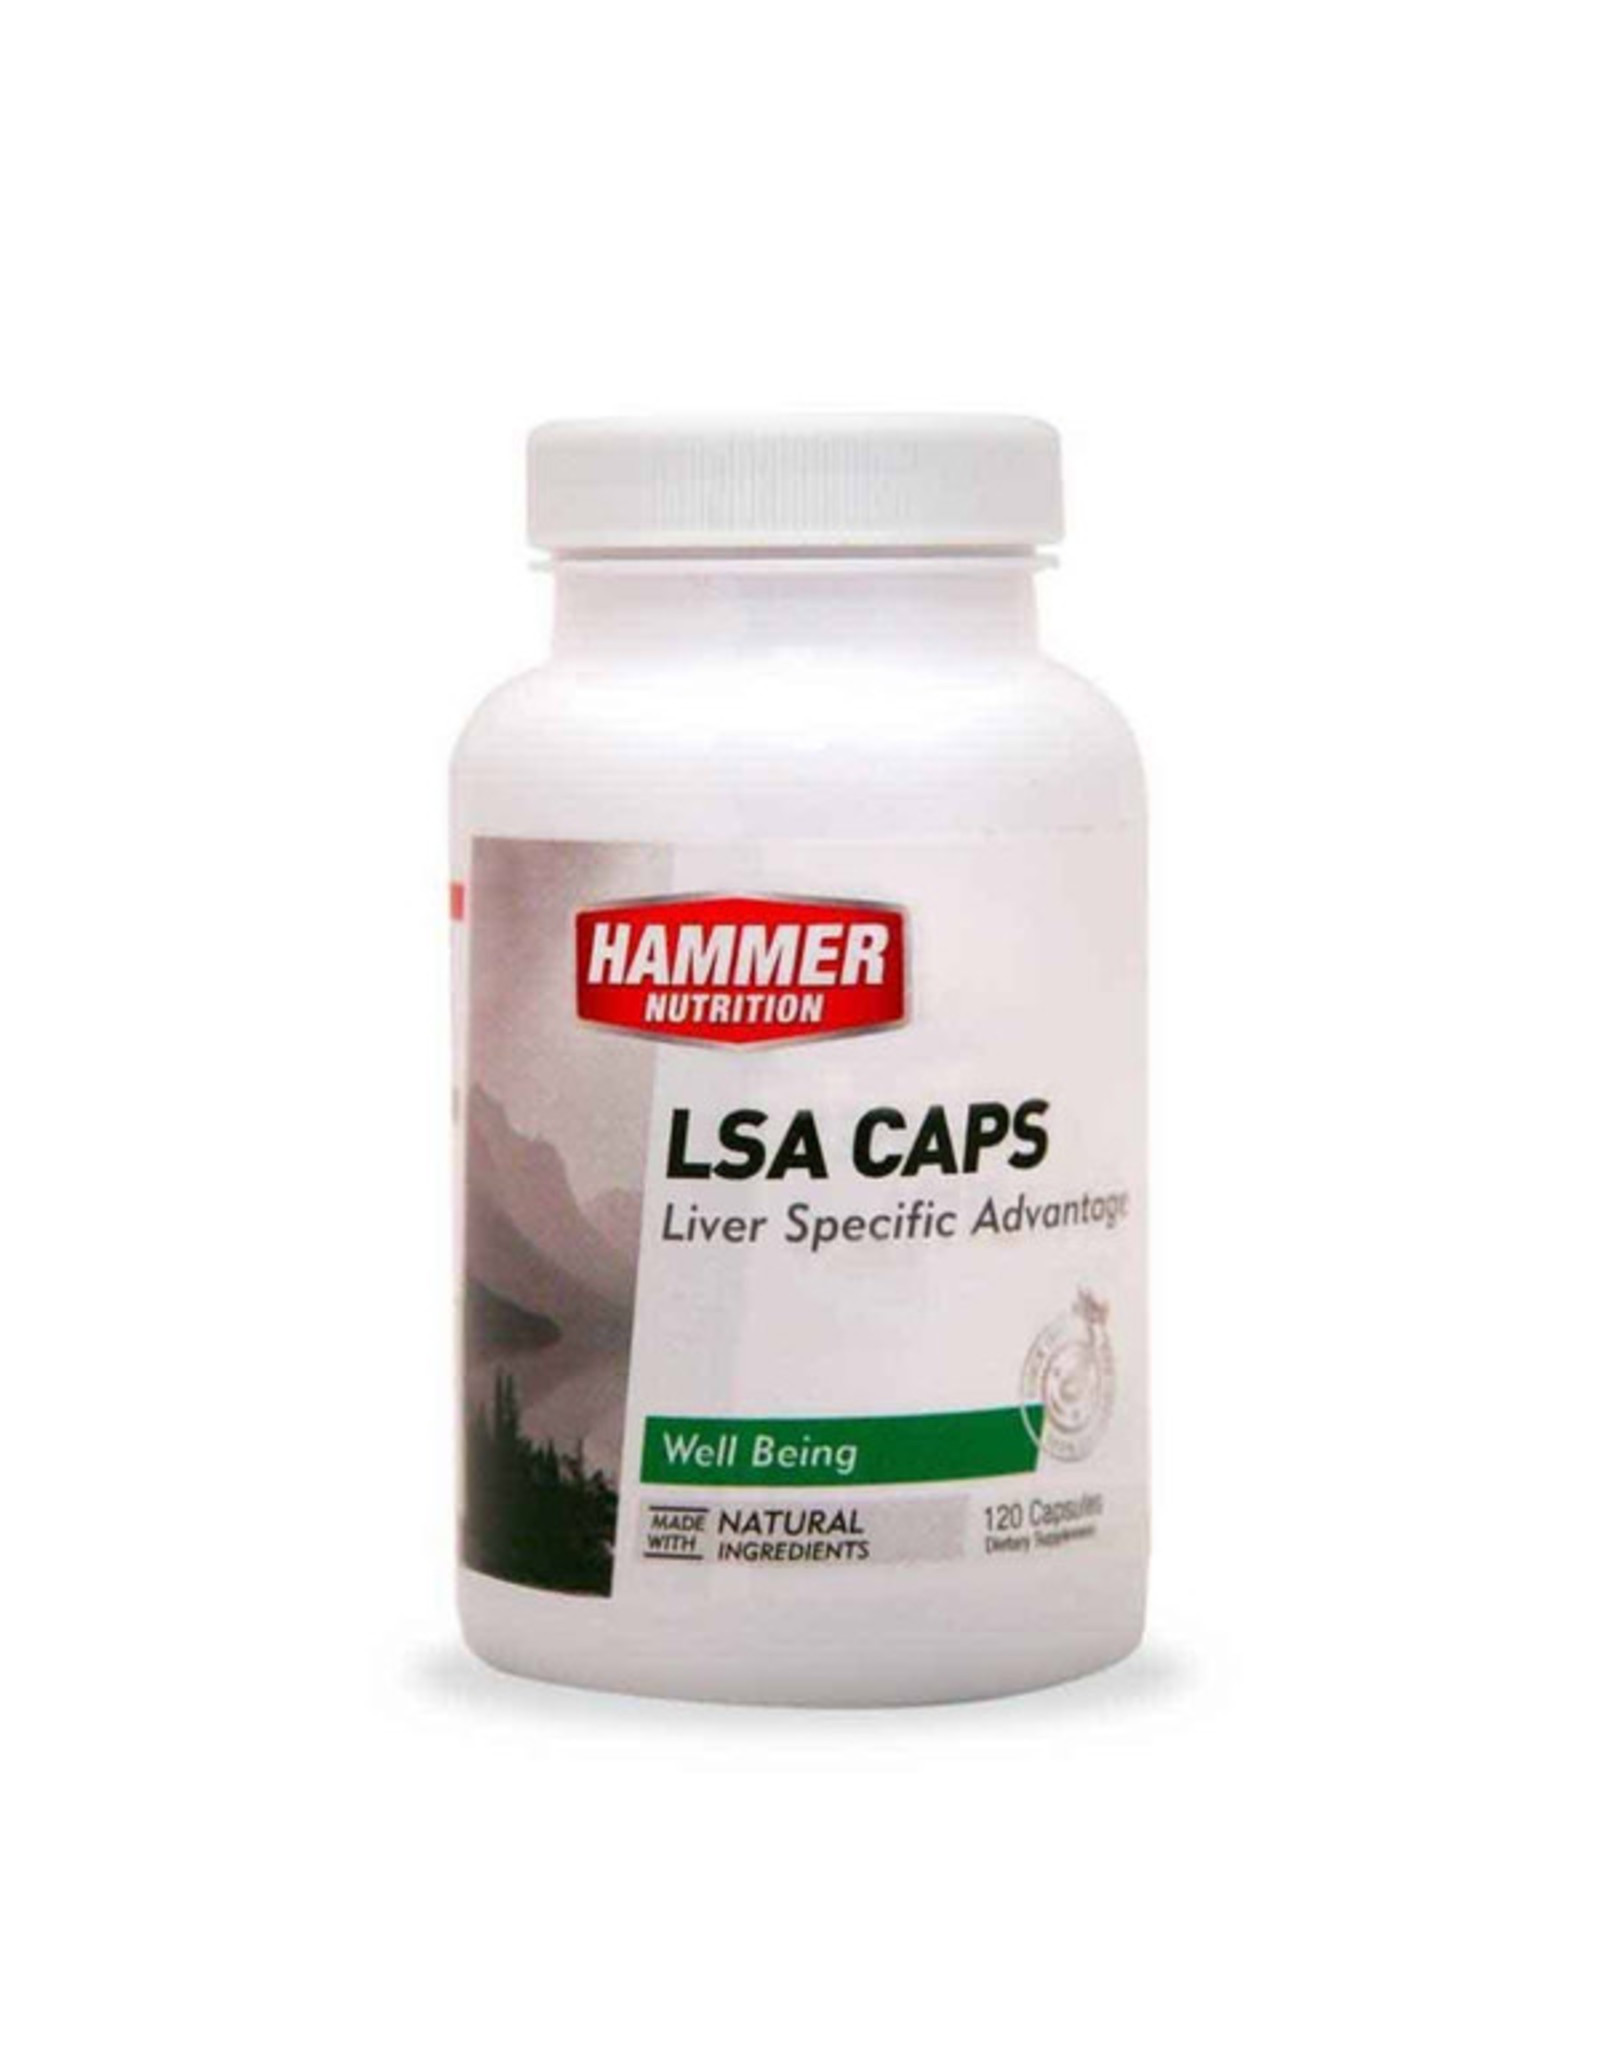 Hammer Nutrition Hammer Nutrition Liver Specific Advantage (120 Cap)